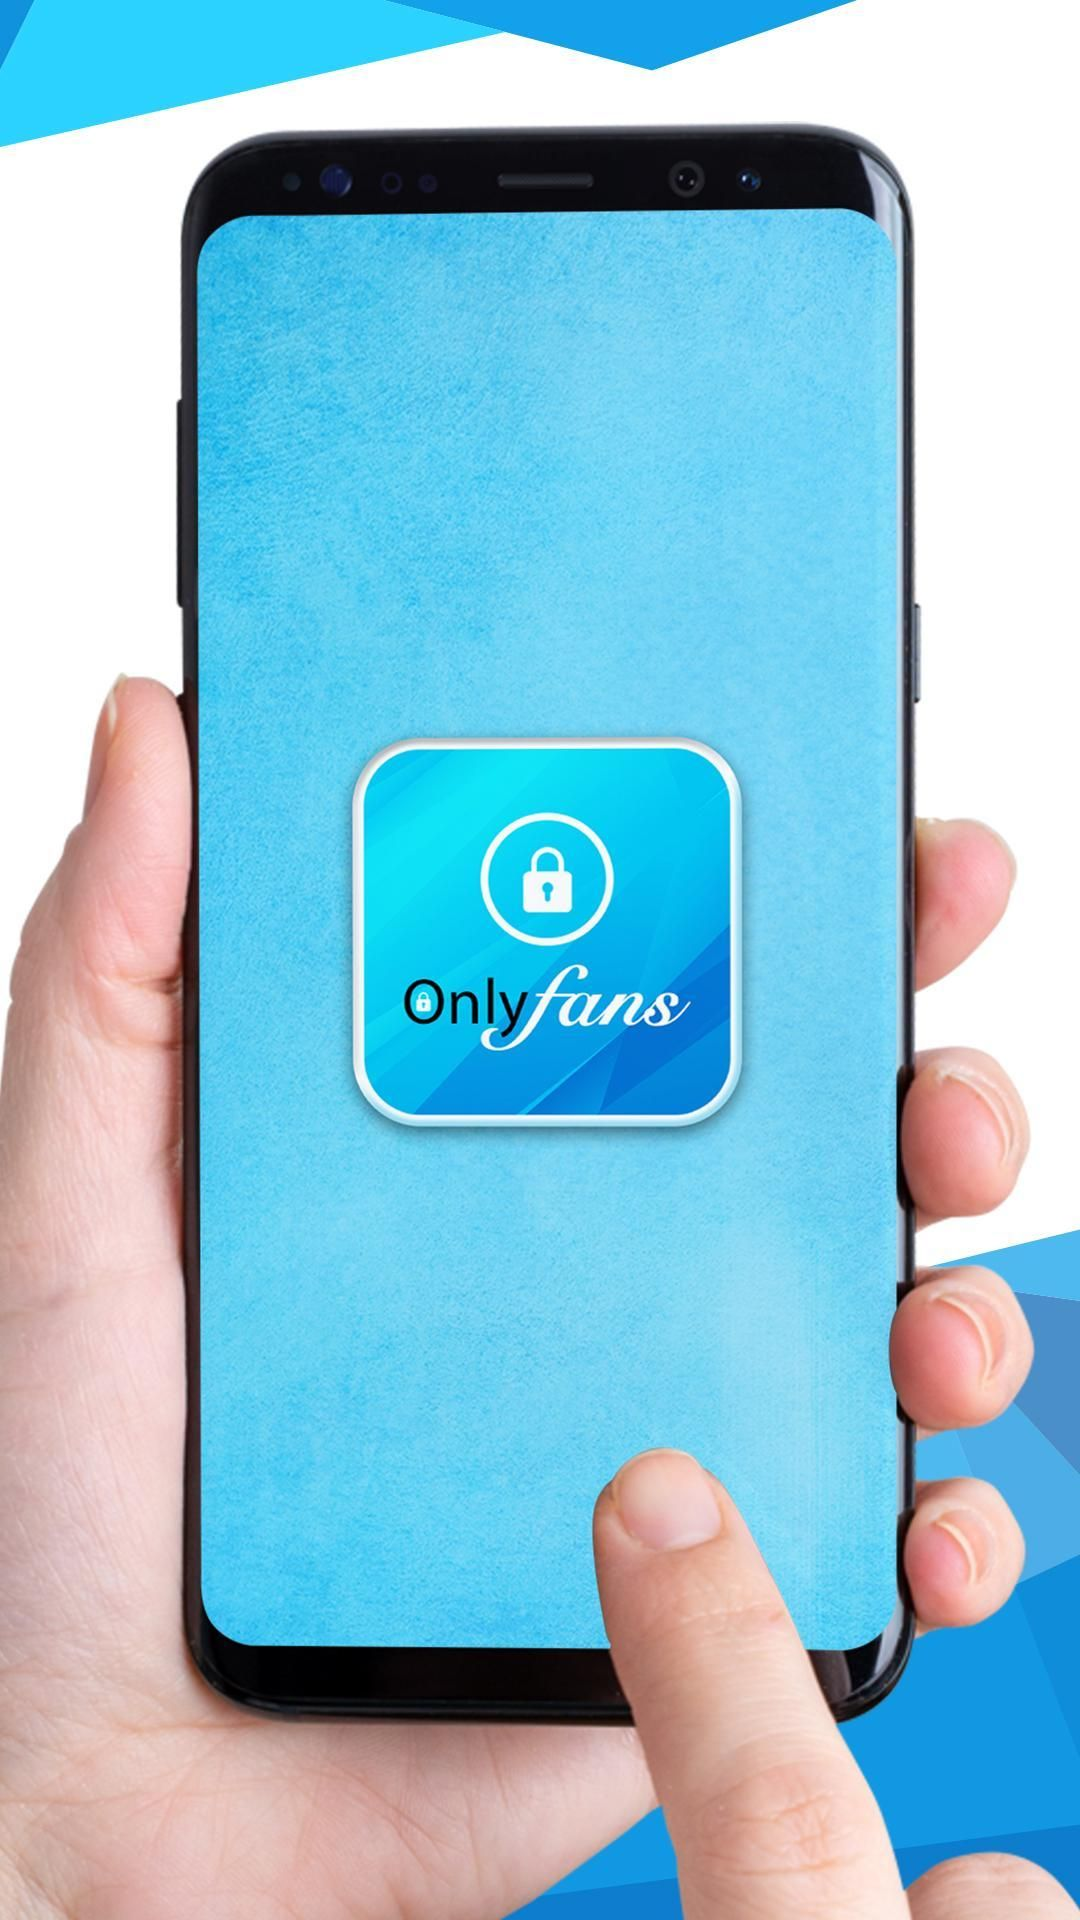 Onlyfans hack free premium account app